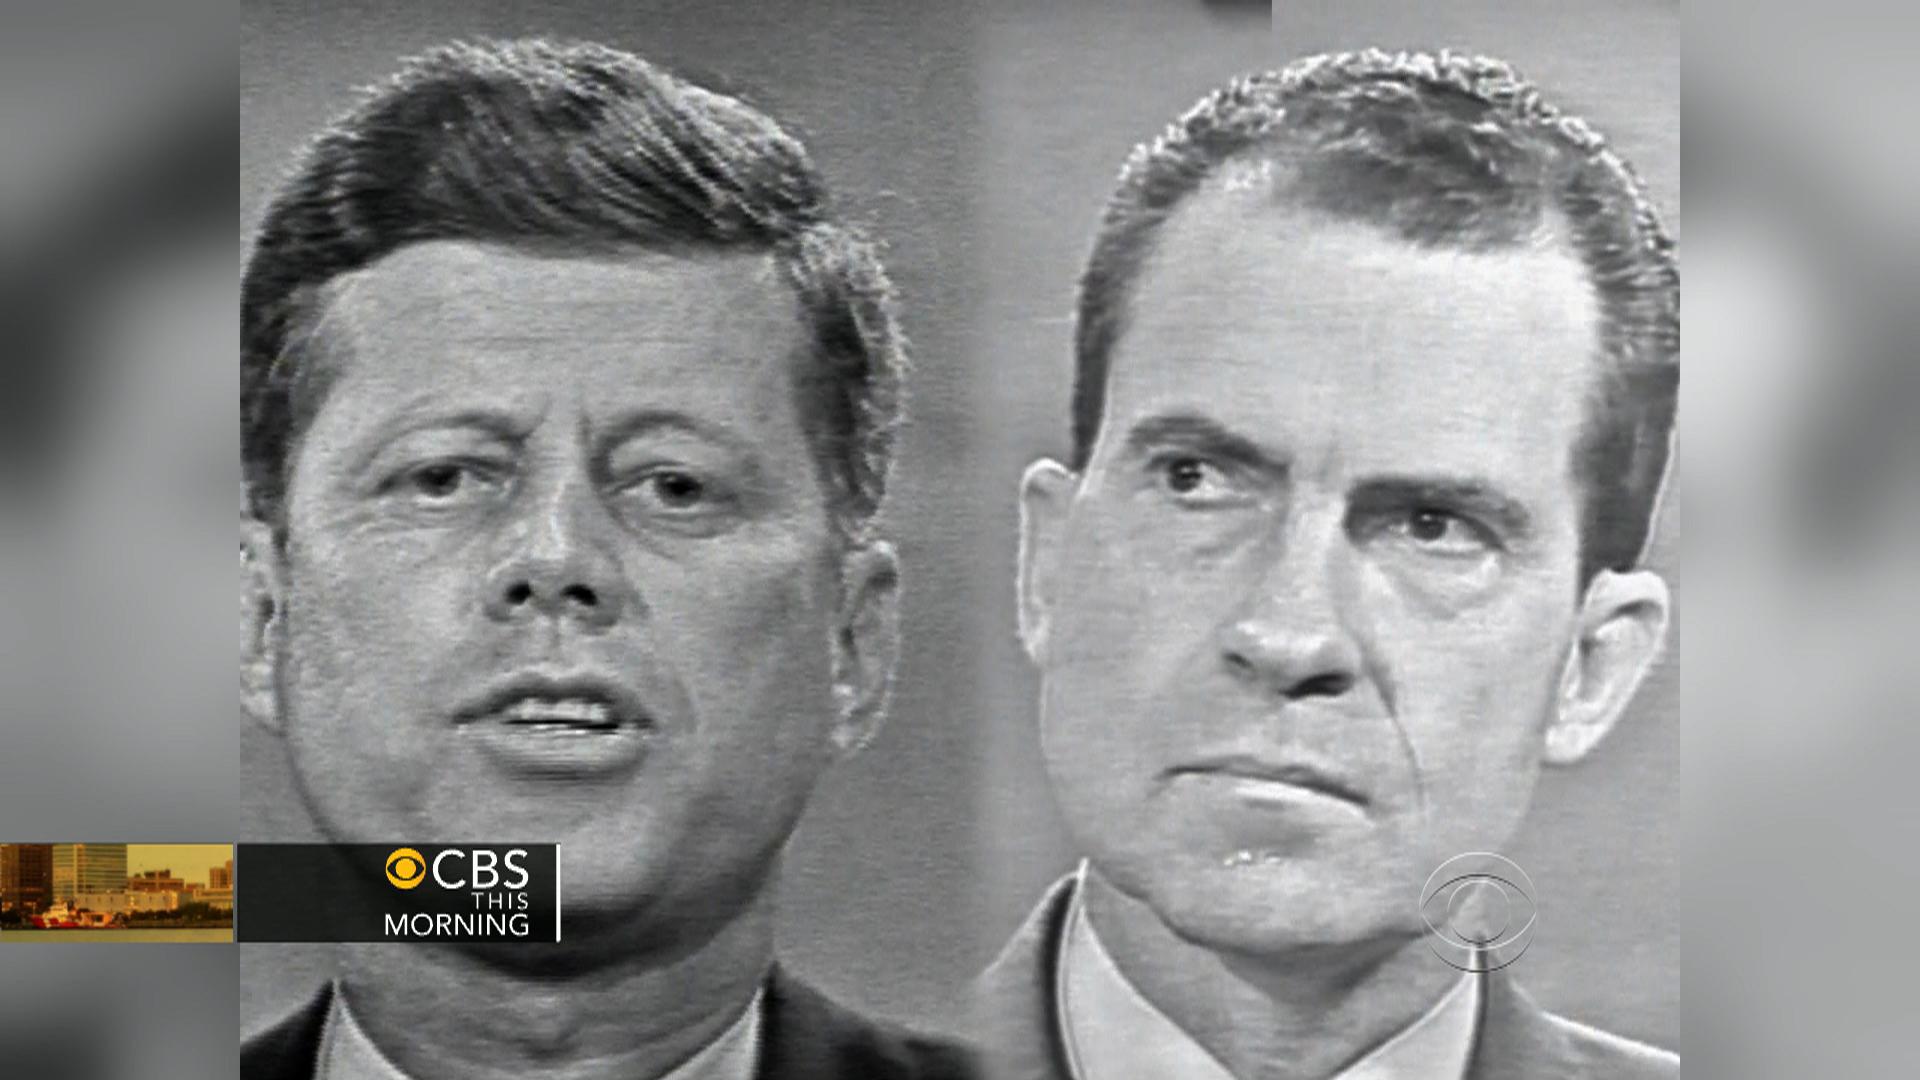 White House tapes reveal JFK debate haunted Nixon - CBS News